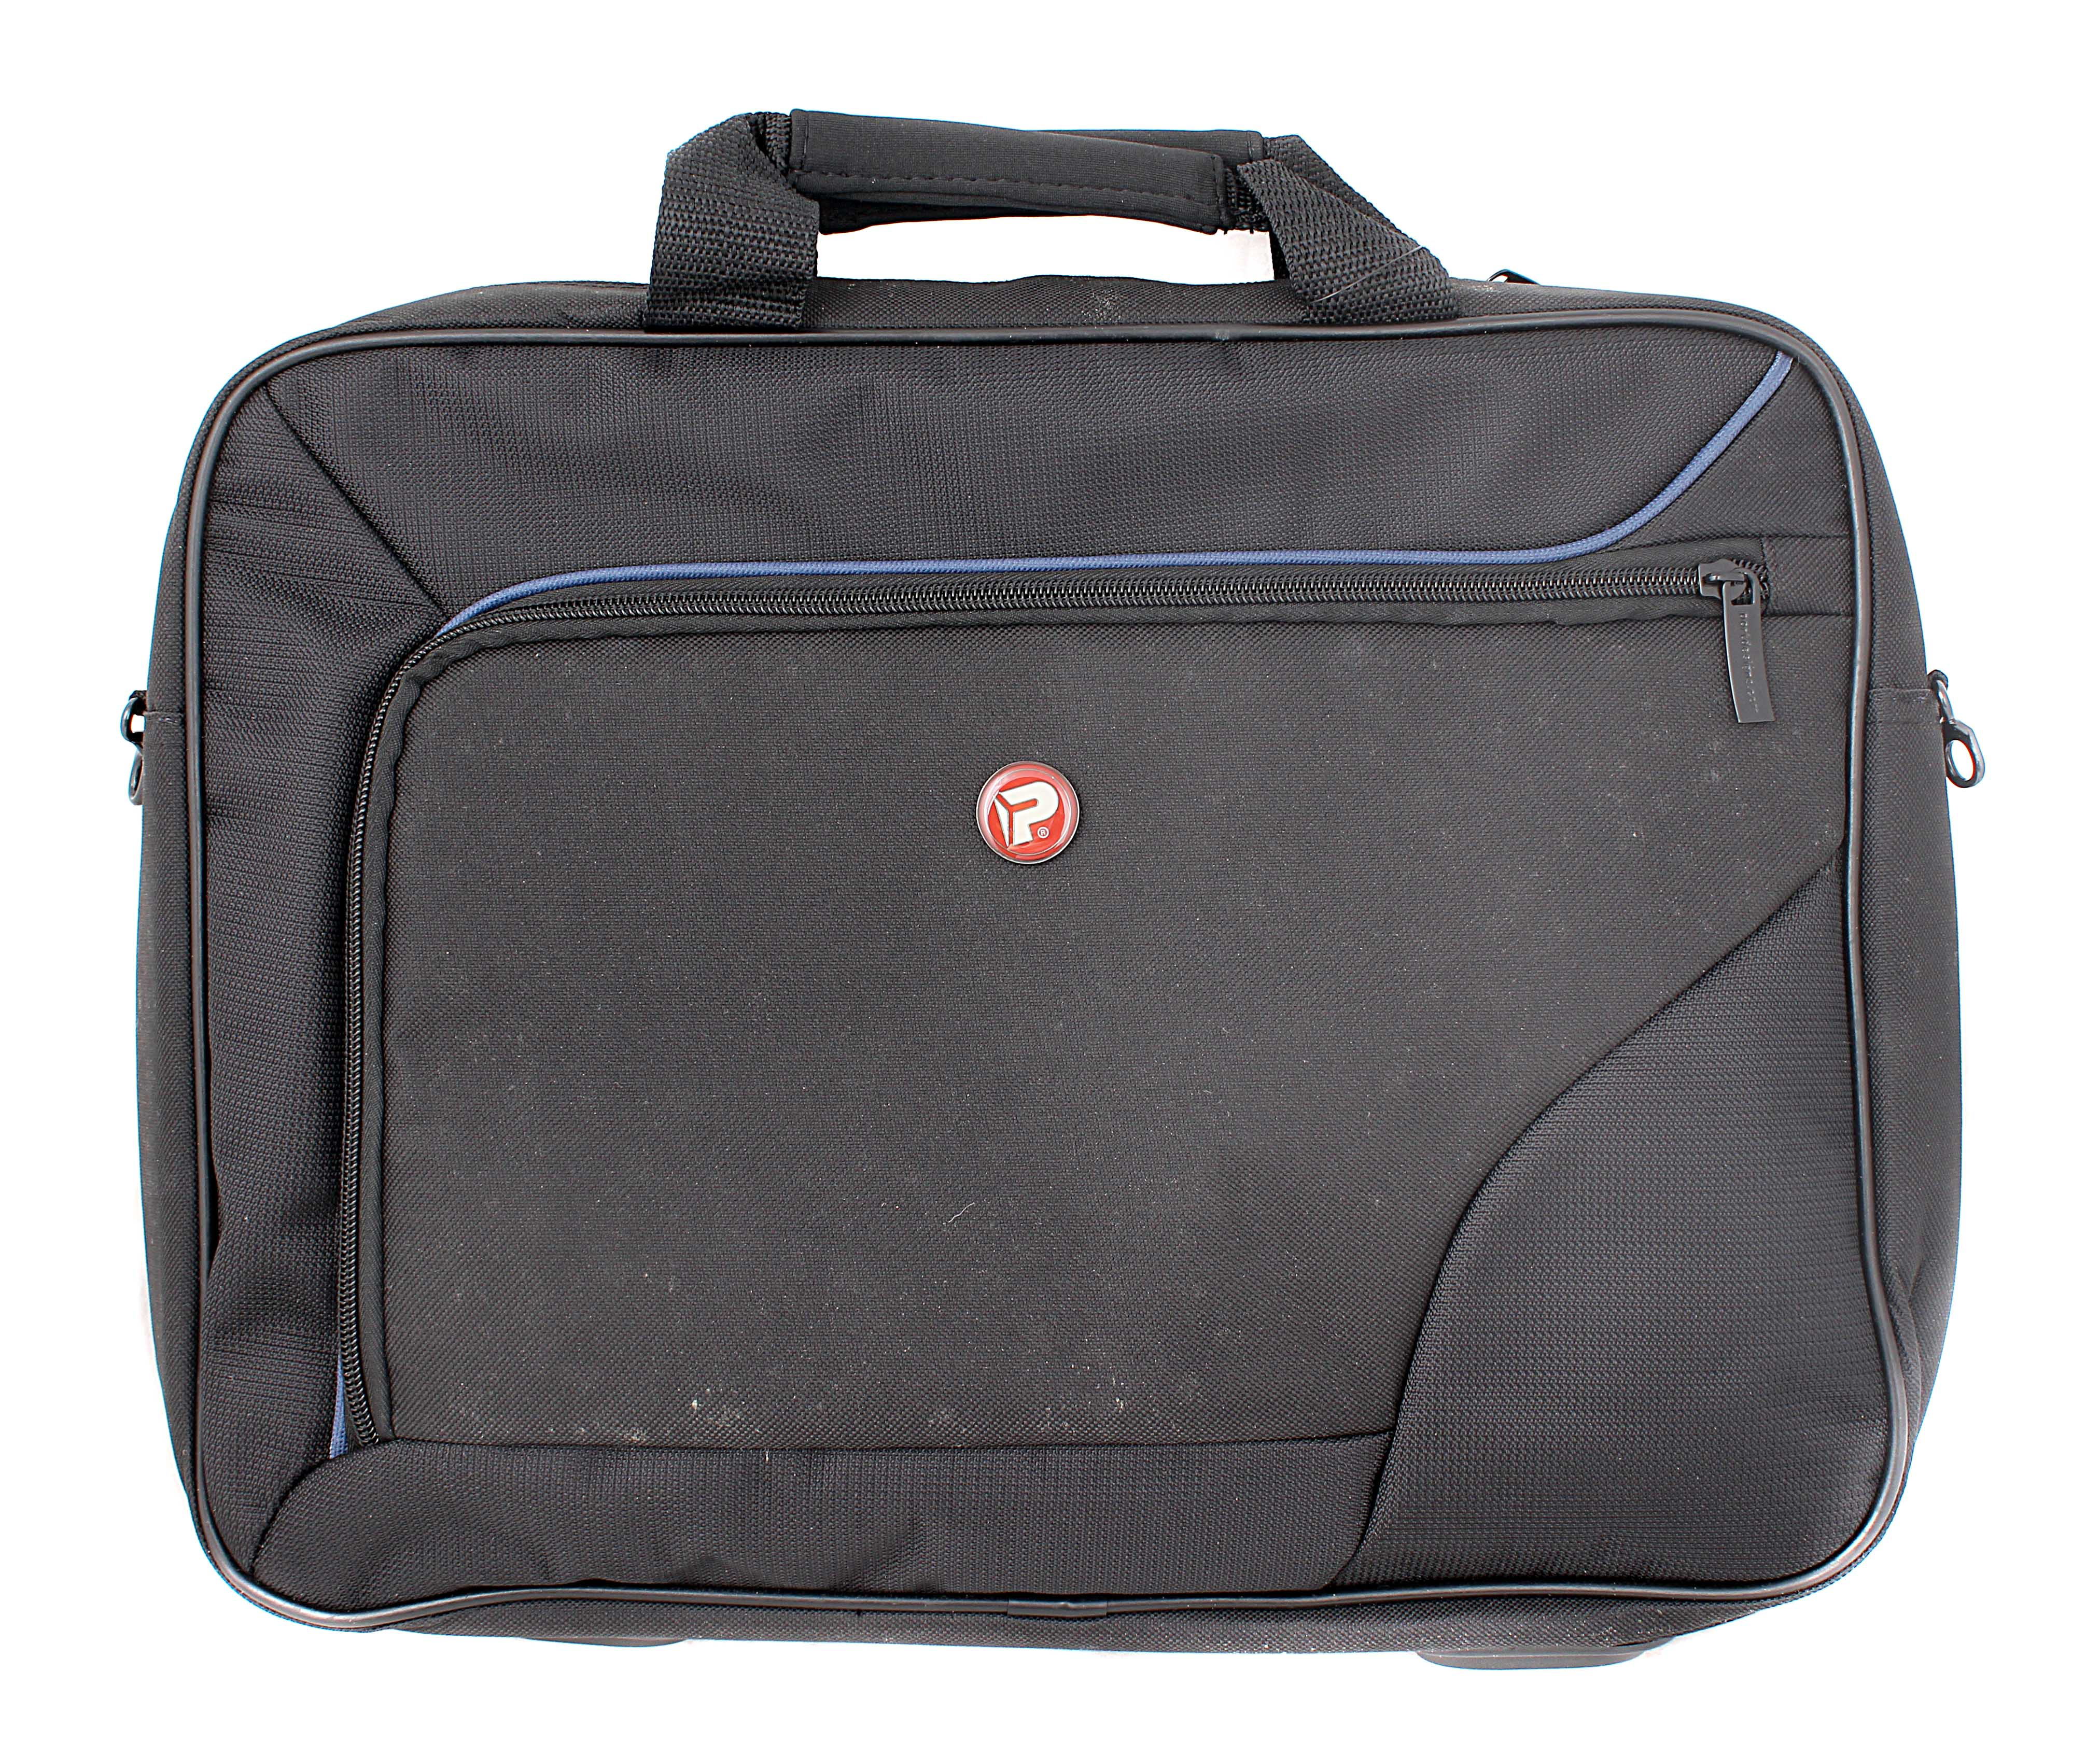 Кейс для ноутбука Portdesigns Real Brand Technics 1044.000